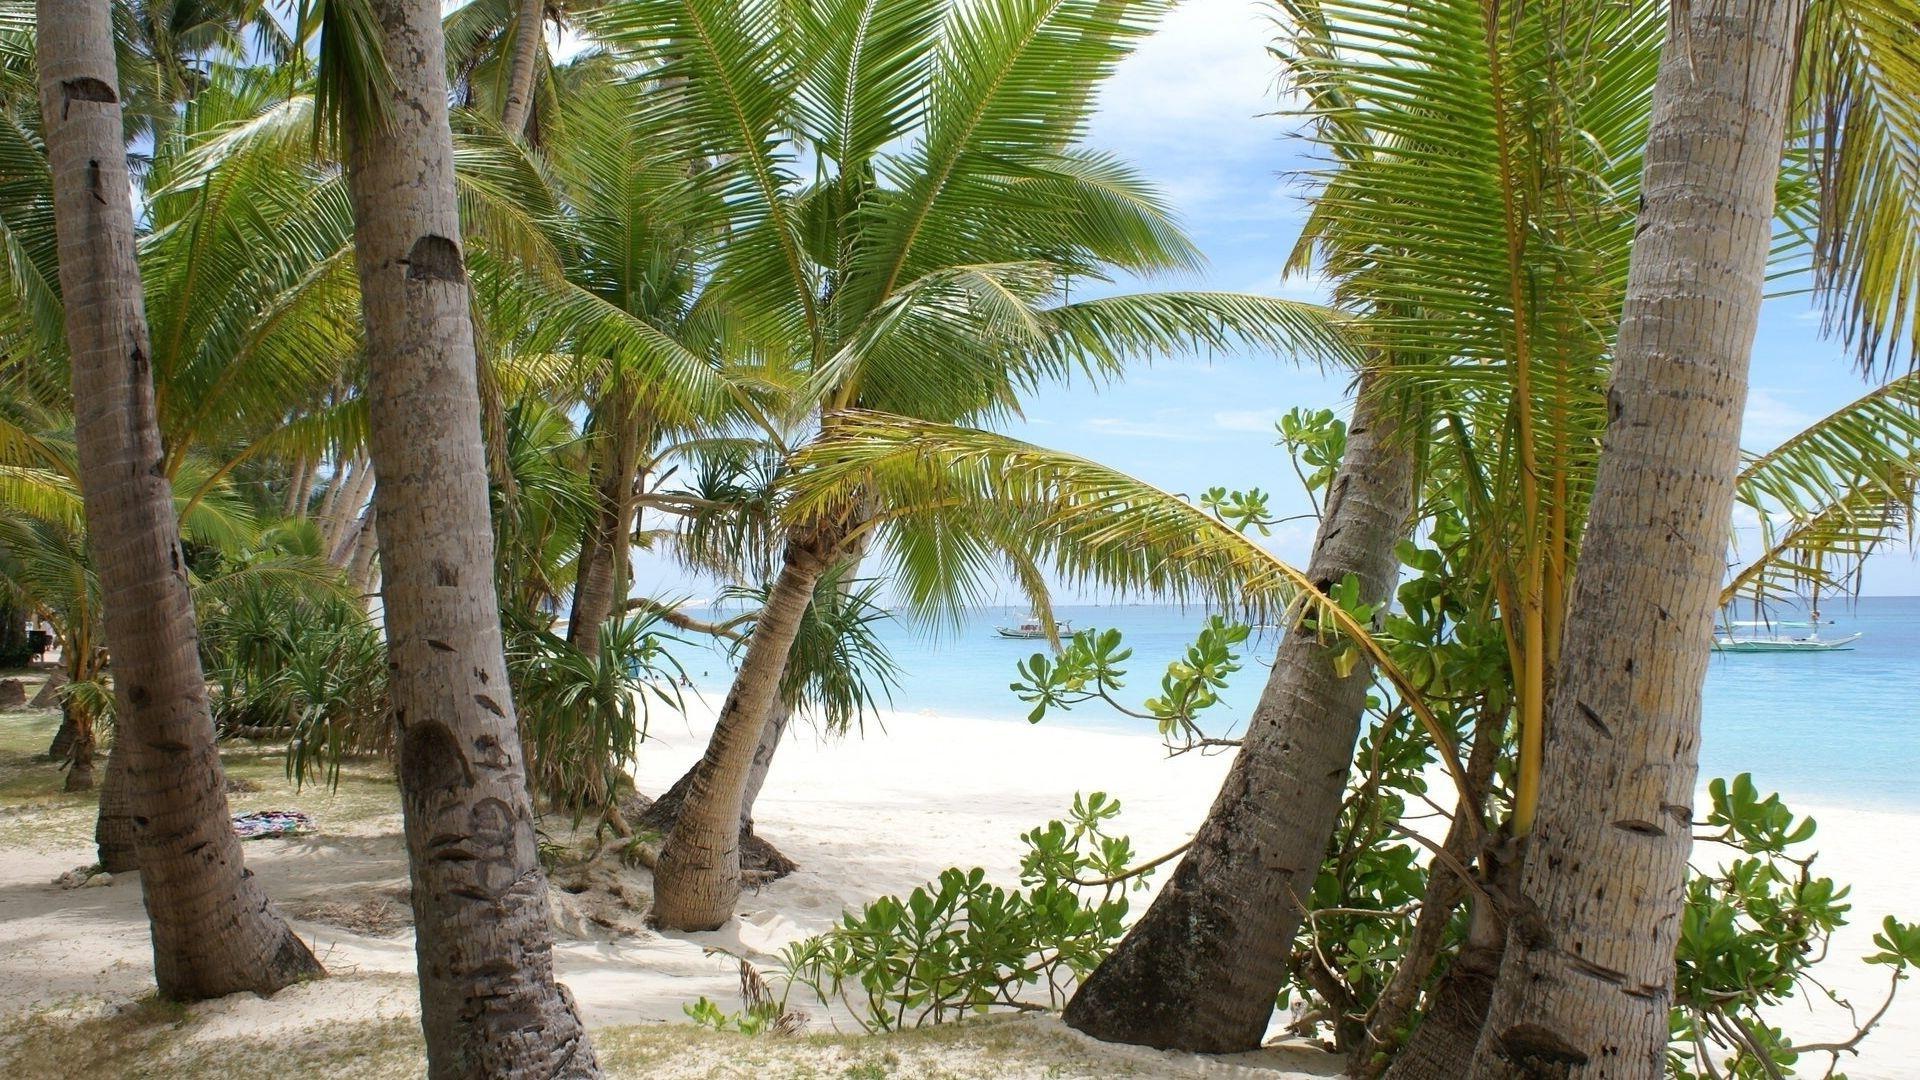 beach palms sand trees